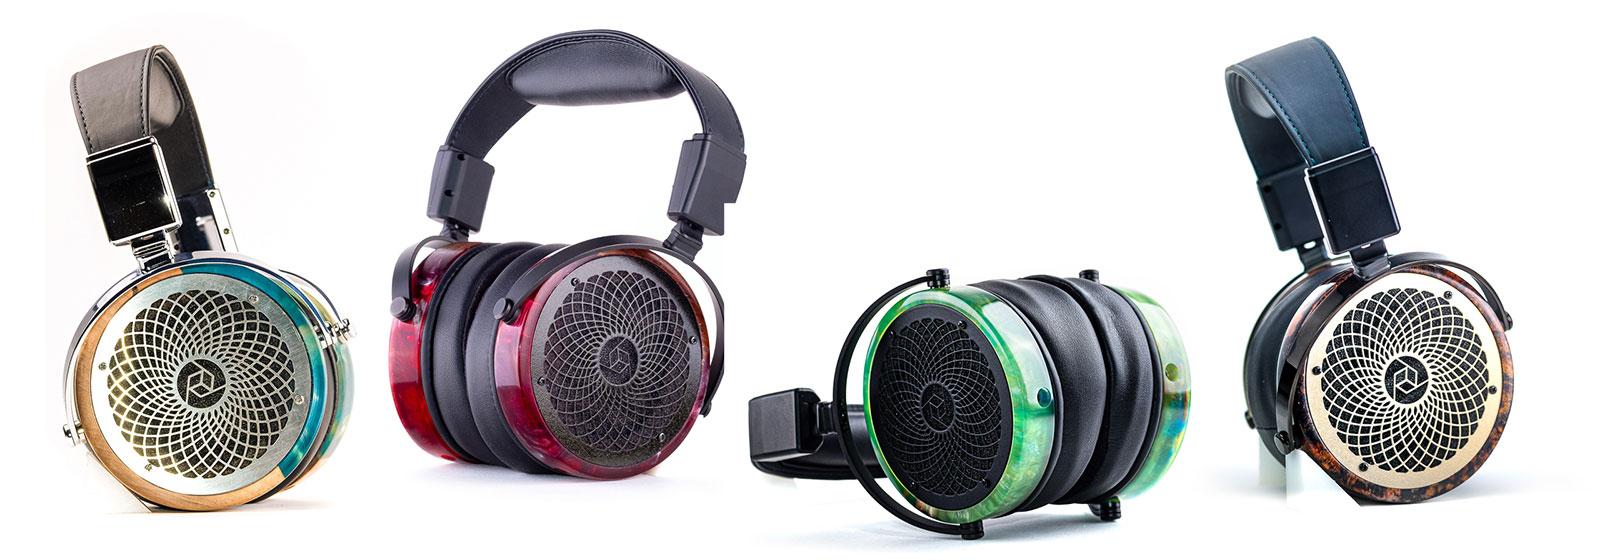 Rosson RAD-0 headphone selection